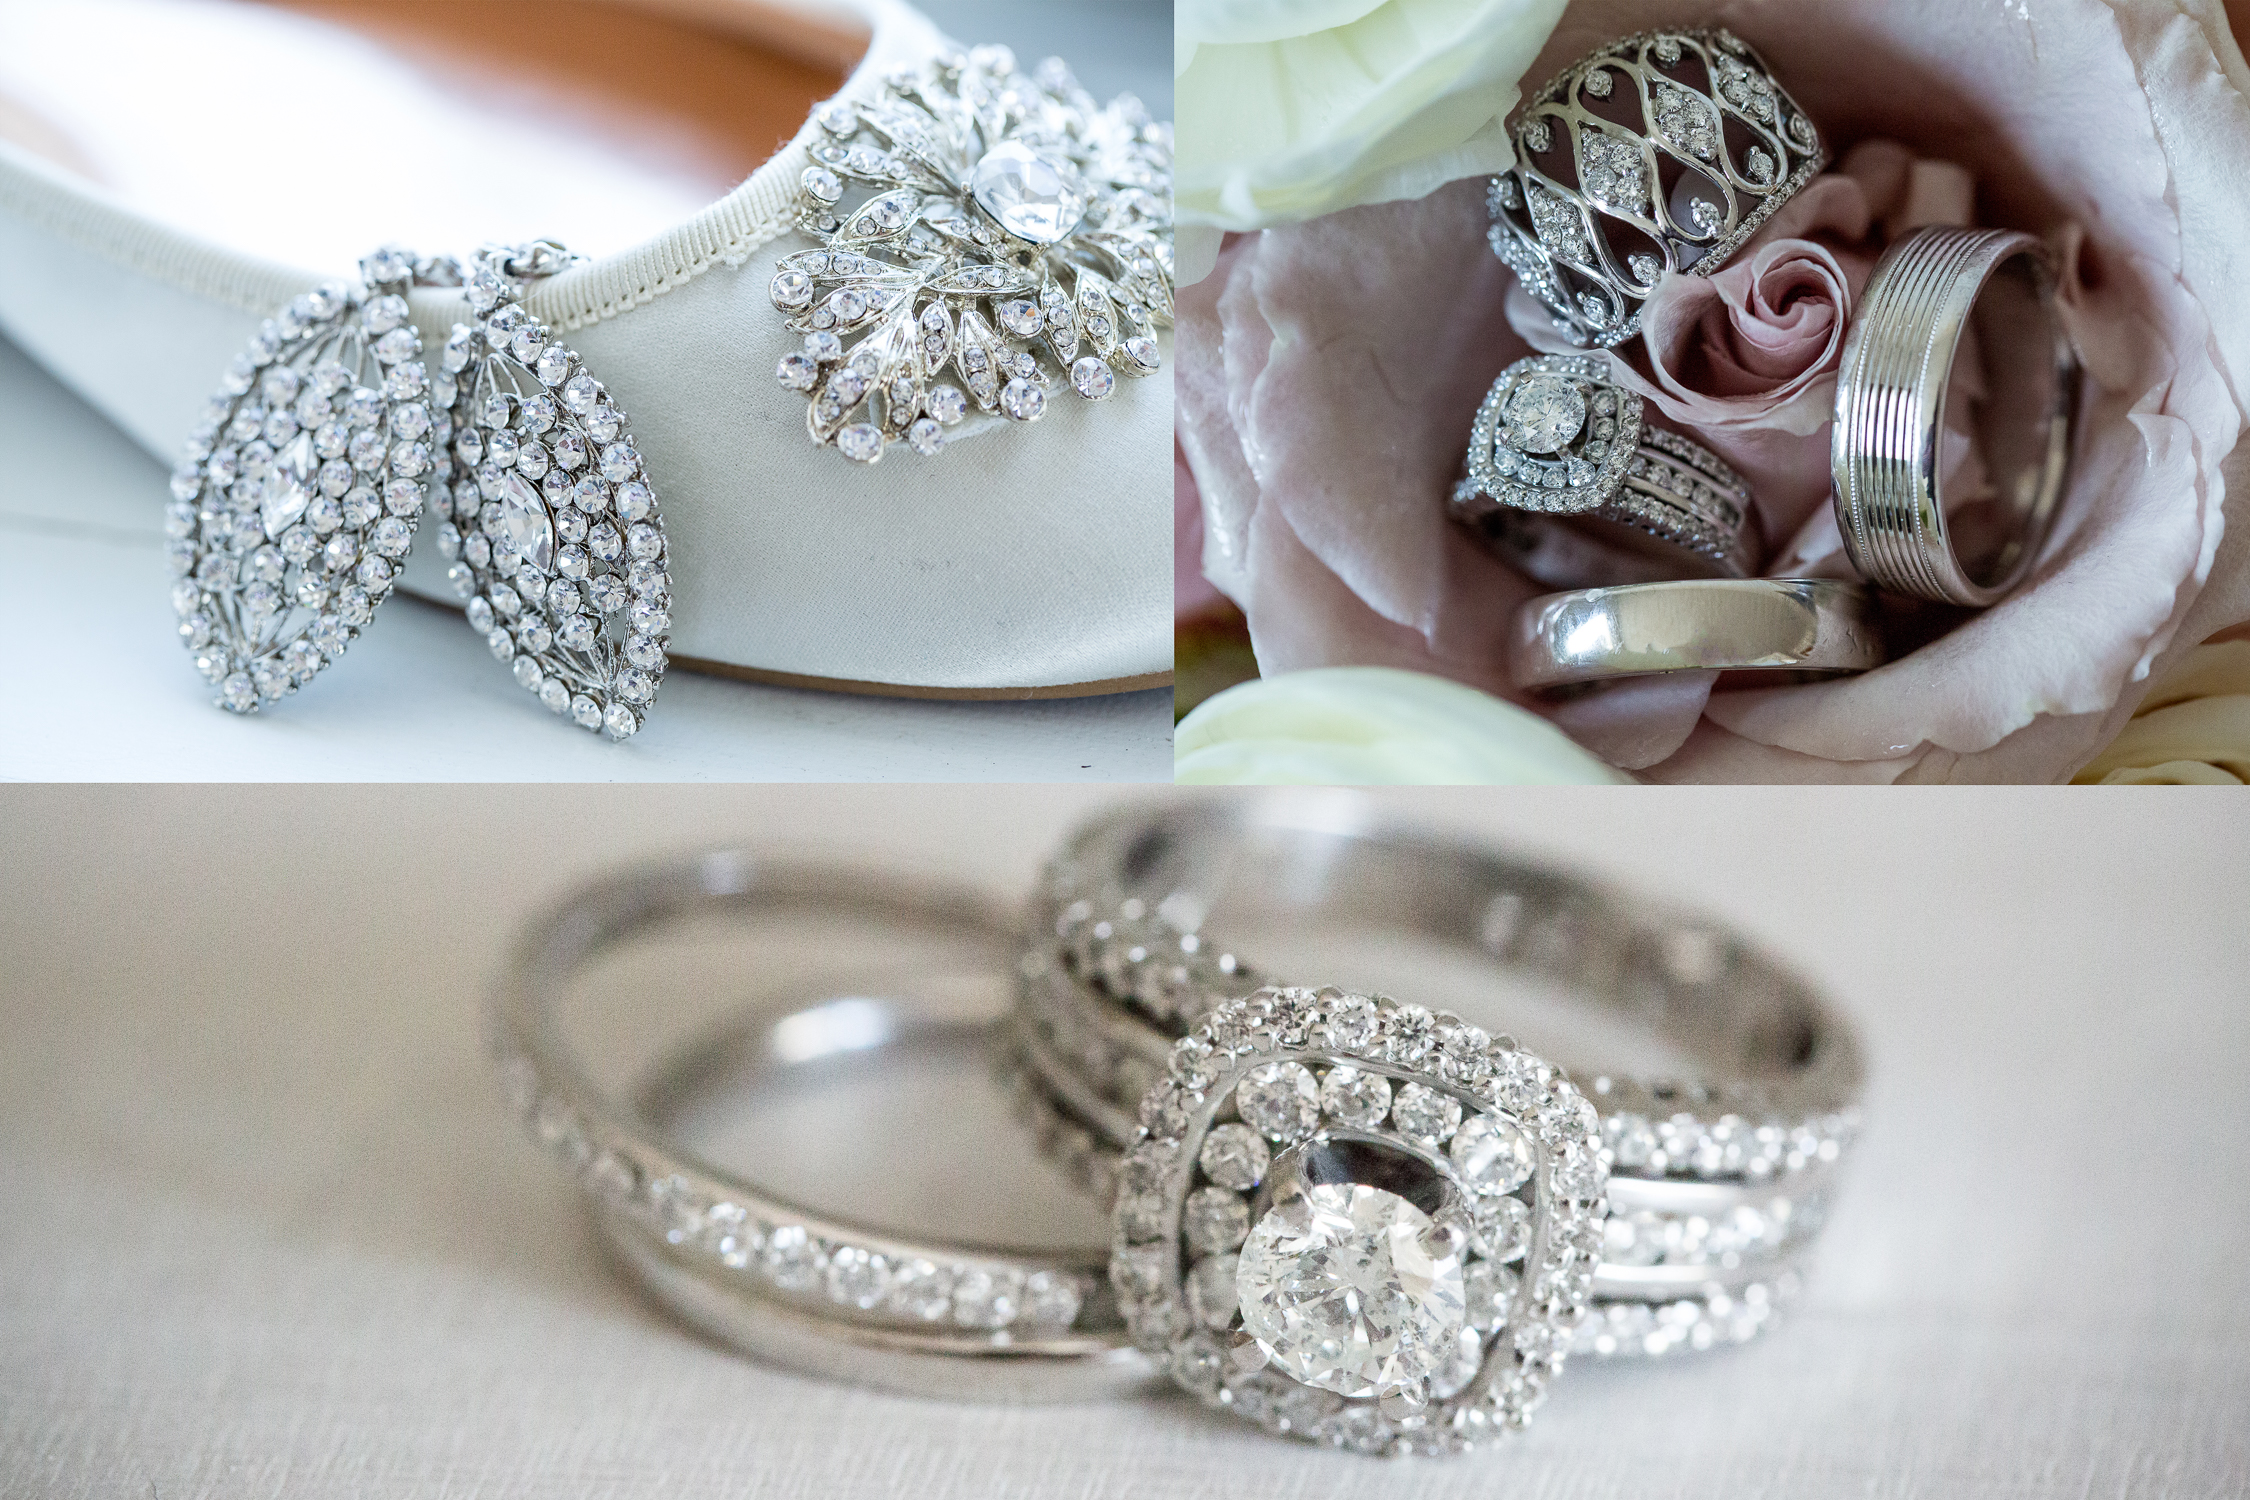 Peter-and-Marie-Wedding-Fontana-Primavera-Graydon-Hall-Manor-Toronto-Ontario-Canada-0062.jpg